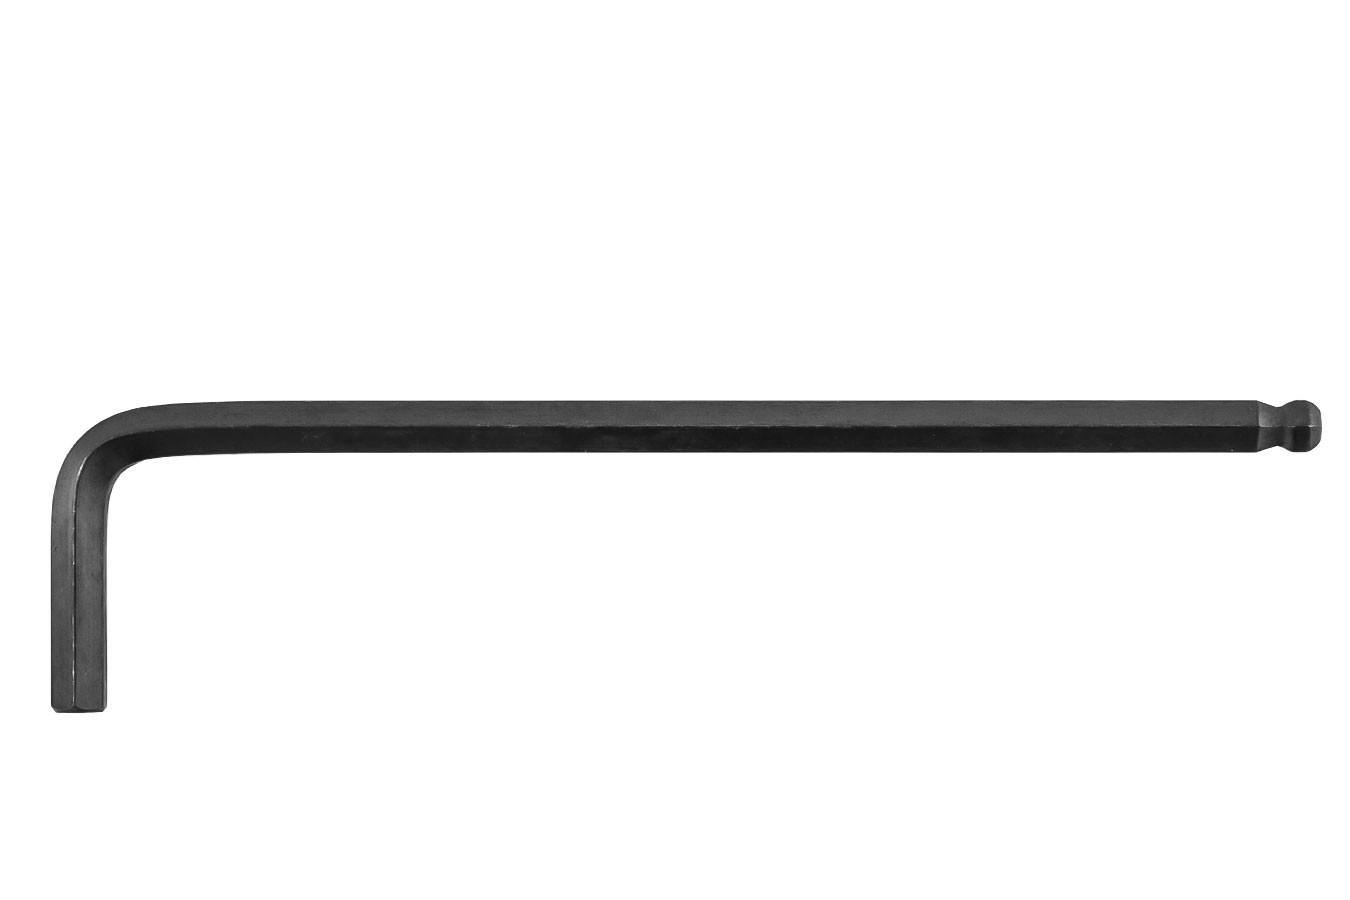 Chave Allen 5 mm com ponta bola - Ice Toolz